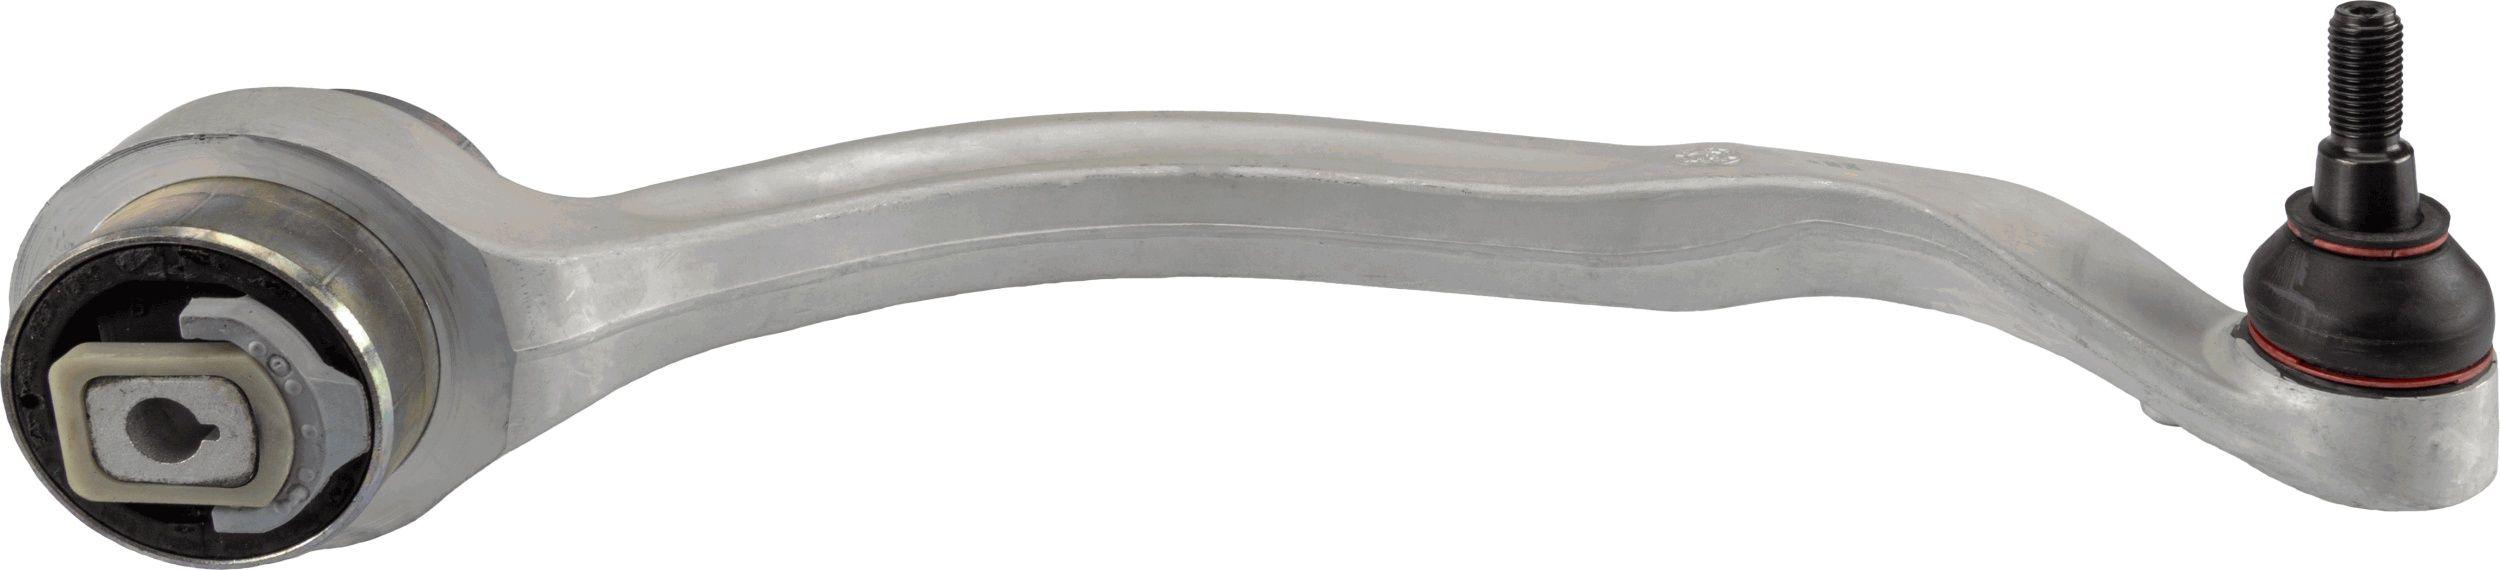 BuyTrack Control Arm TRW JTC350